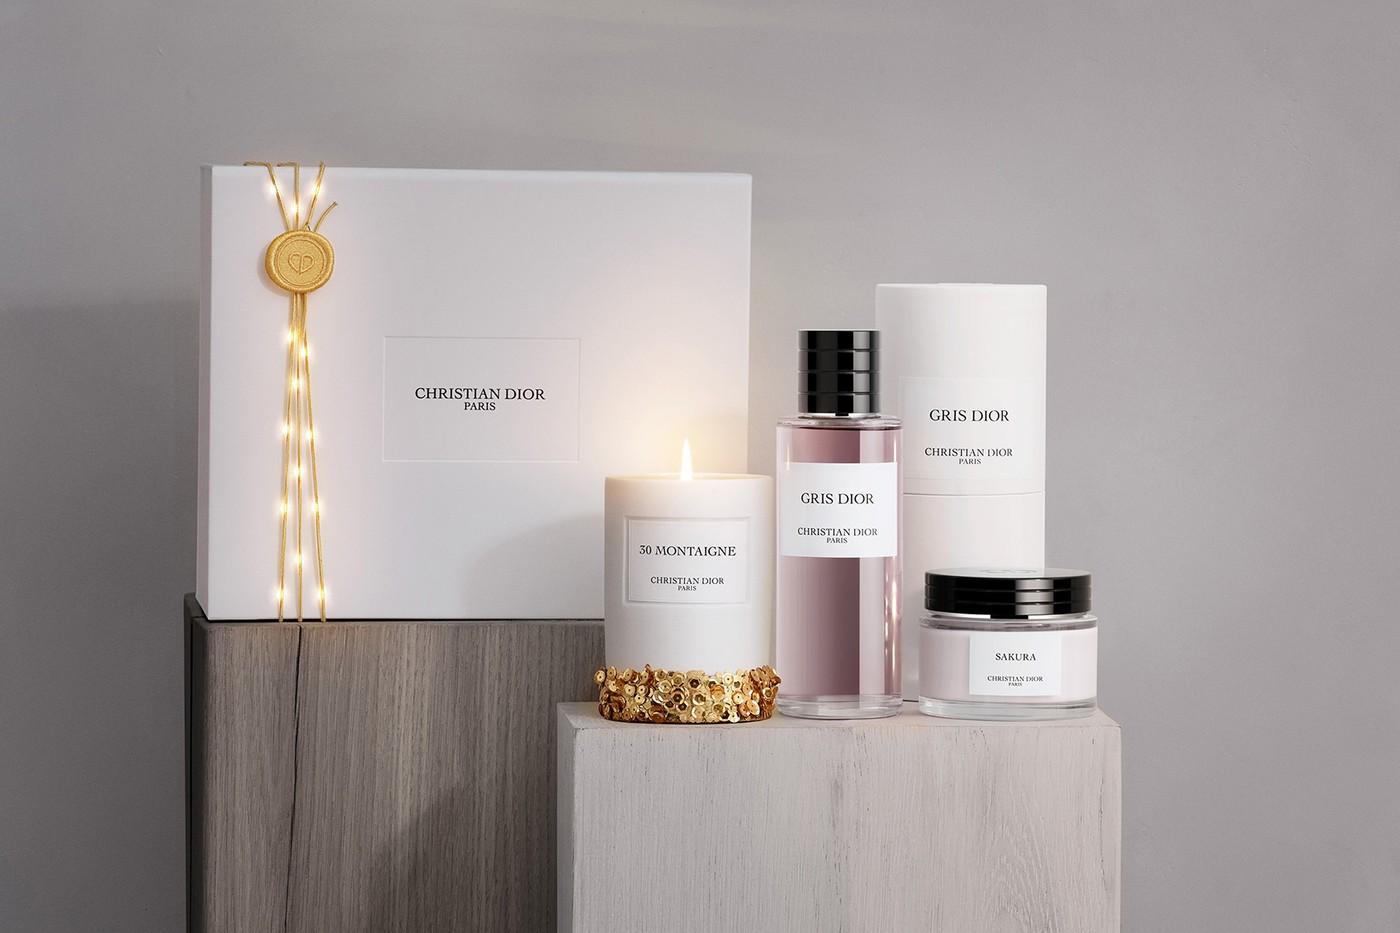 christian dior christmas advent calendar candles perfumes body cream release